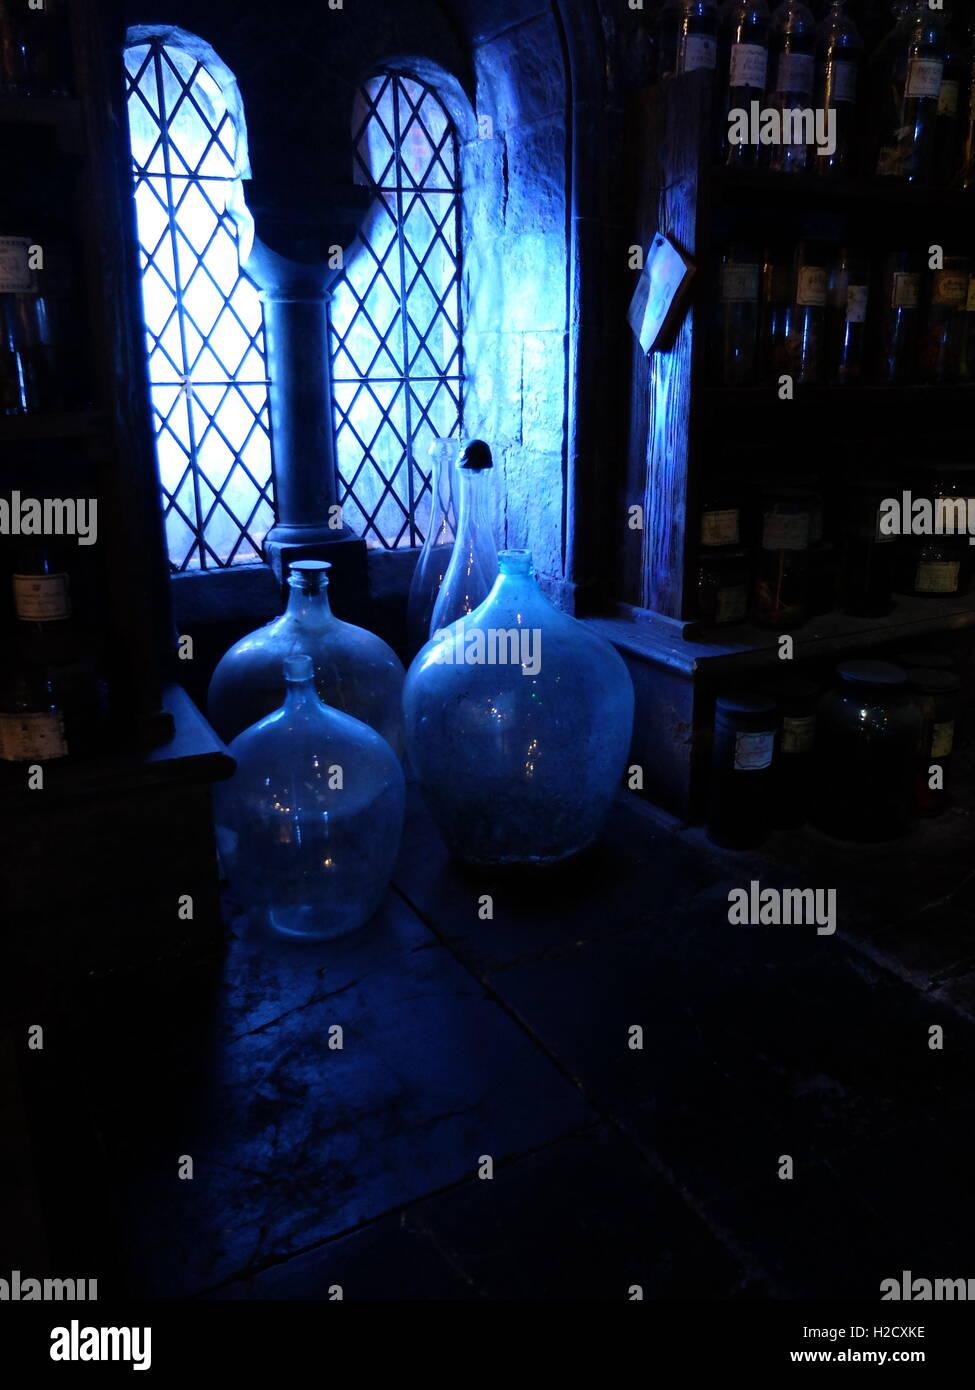 The Making of Harry Potter Warner Bros studio Tour, London. Potions bottles - Stock Image